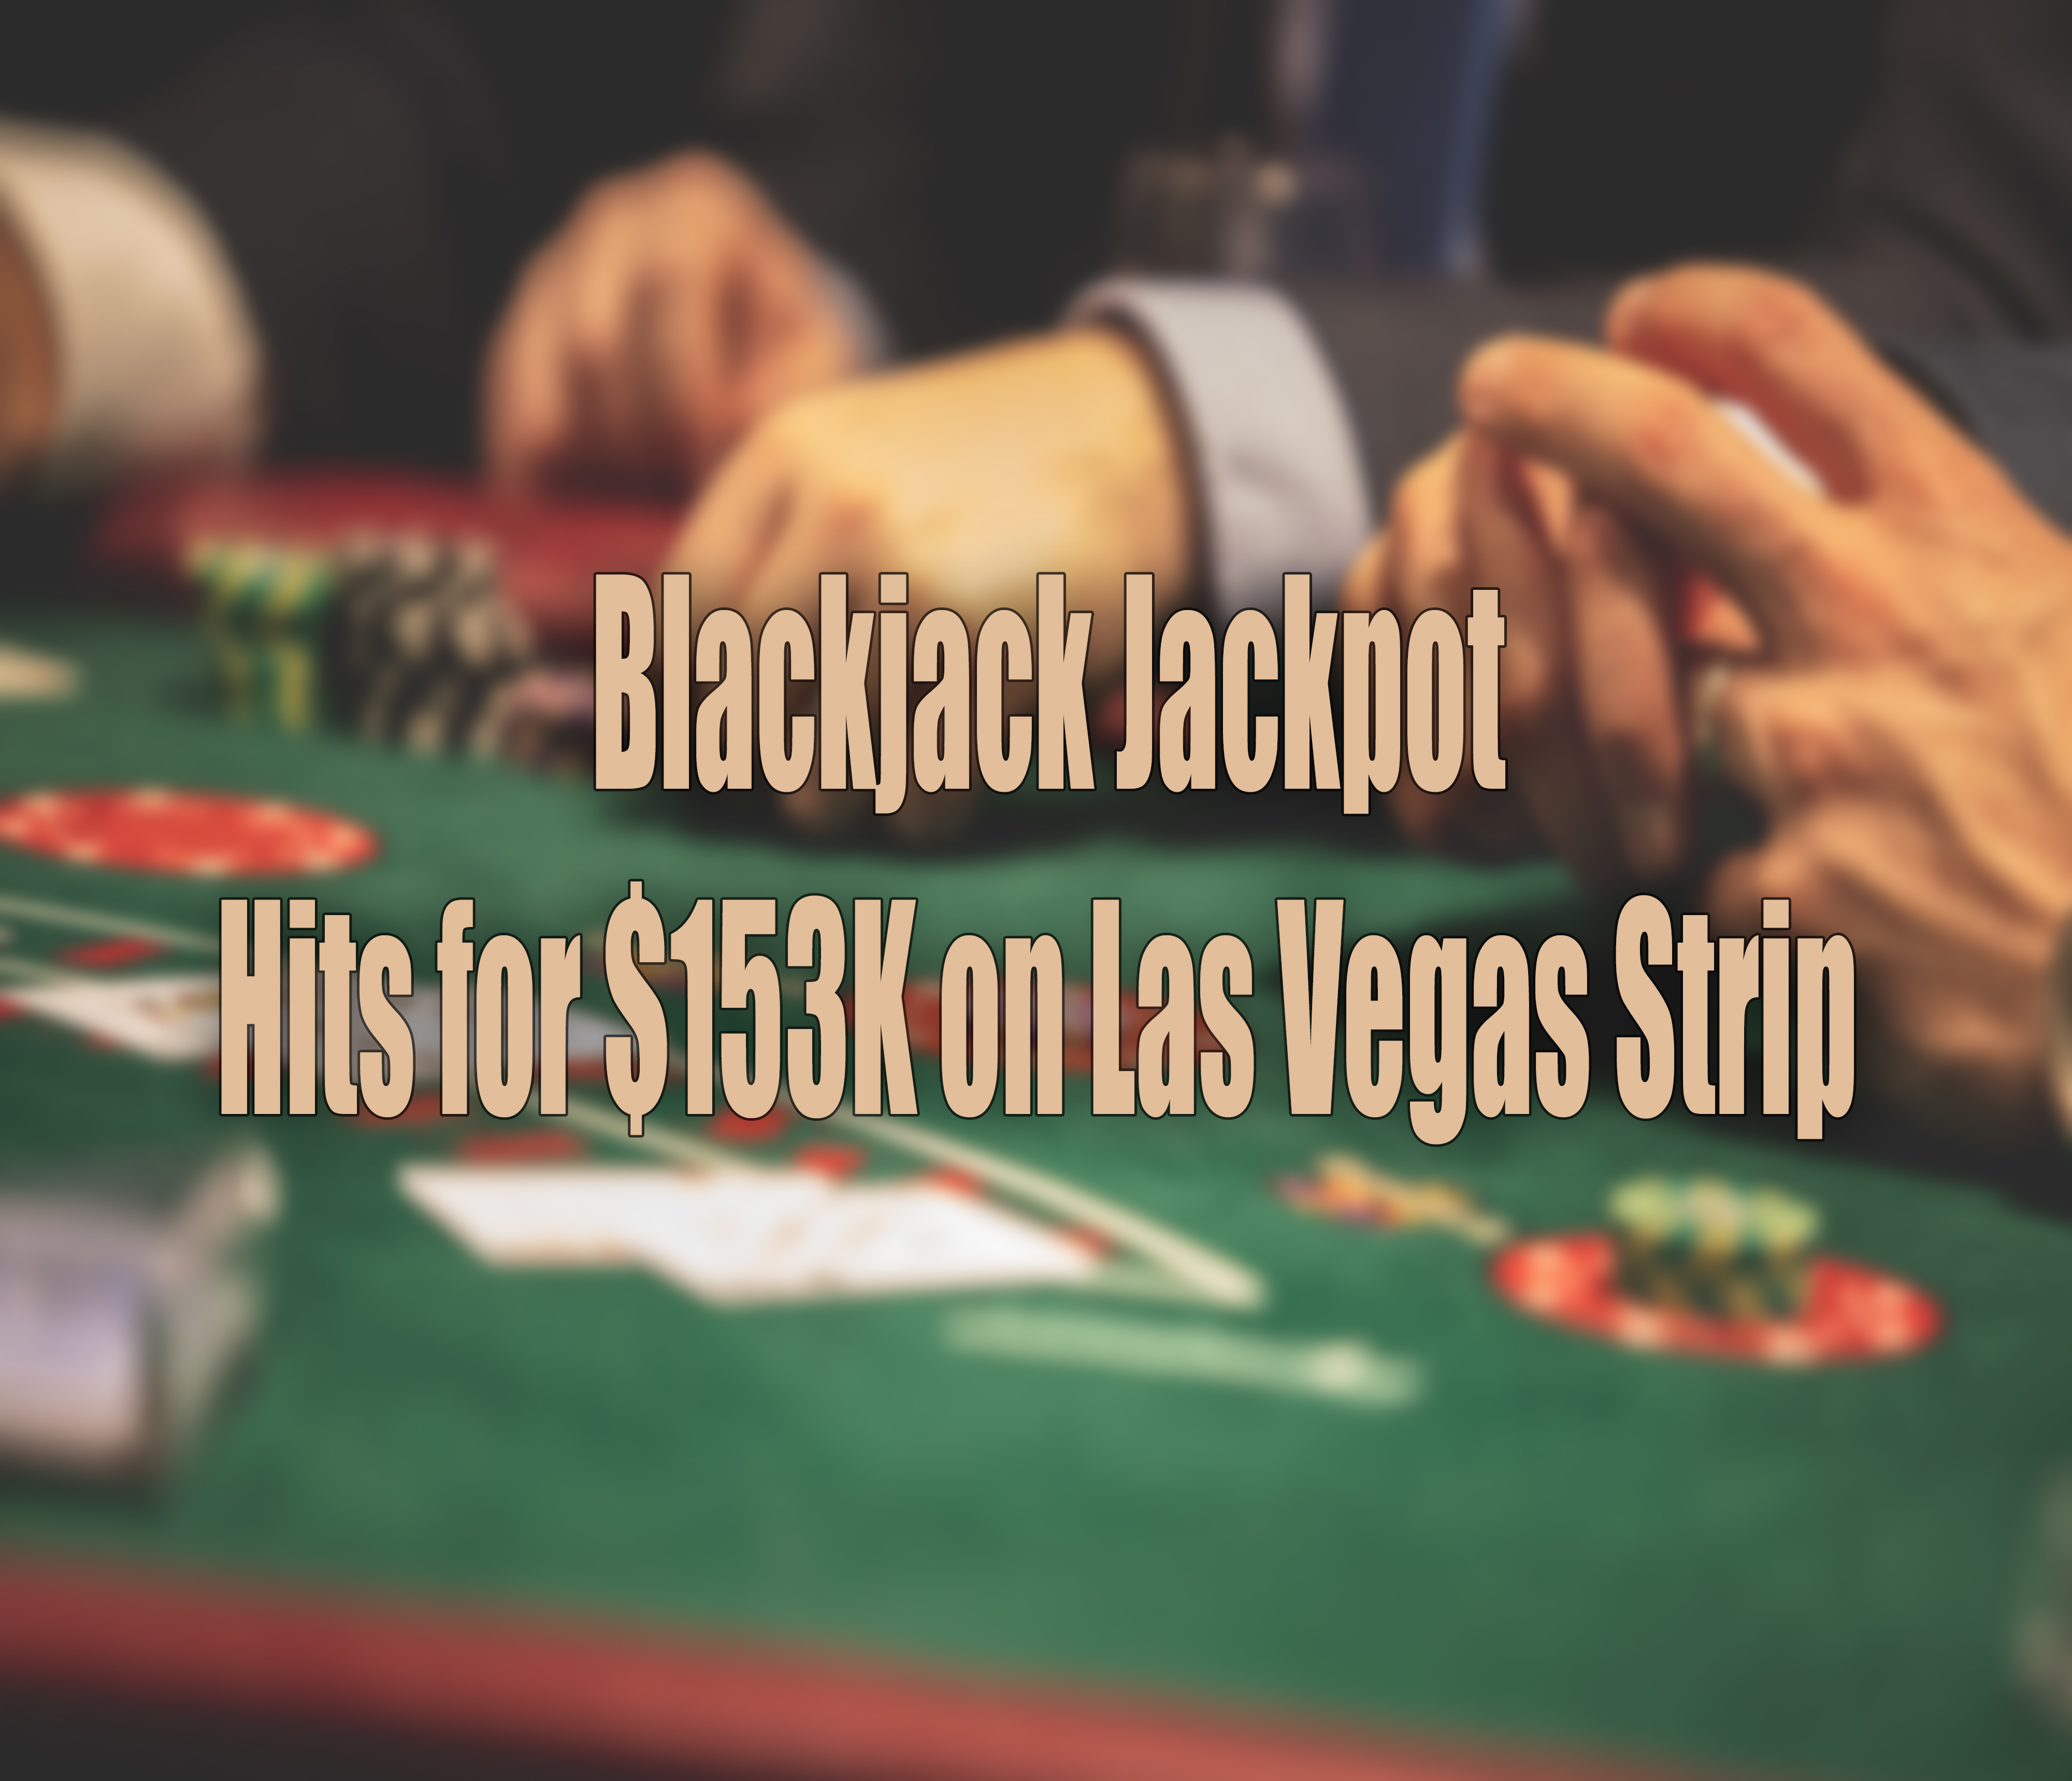 Blackjack Jackpot in Las Vegas.jpg